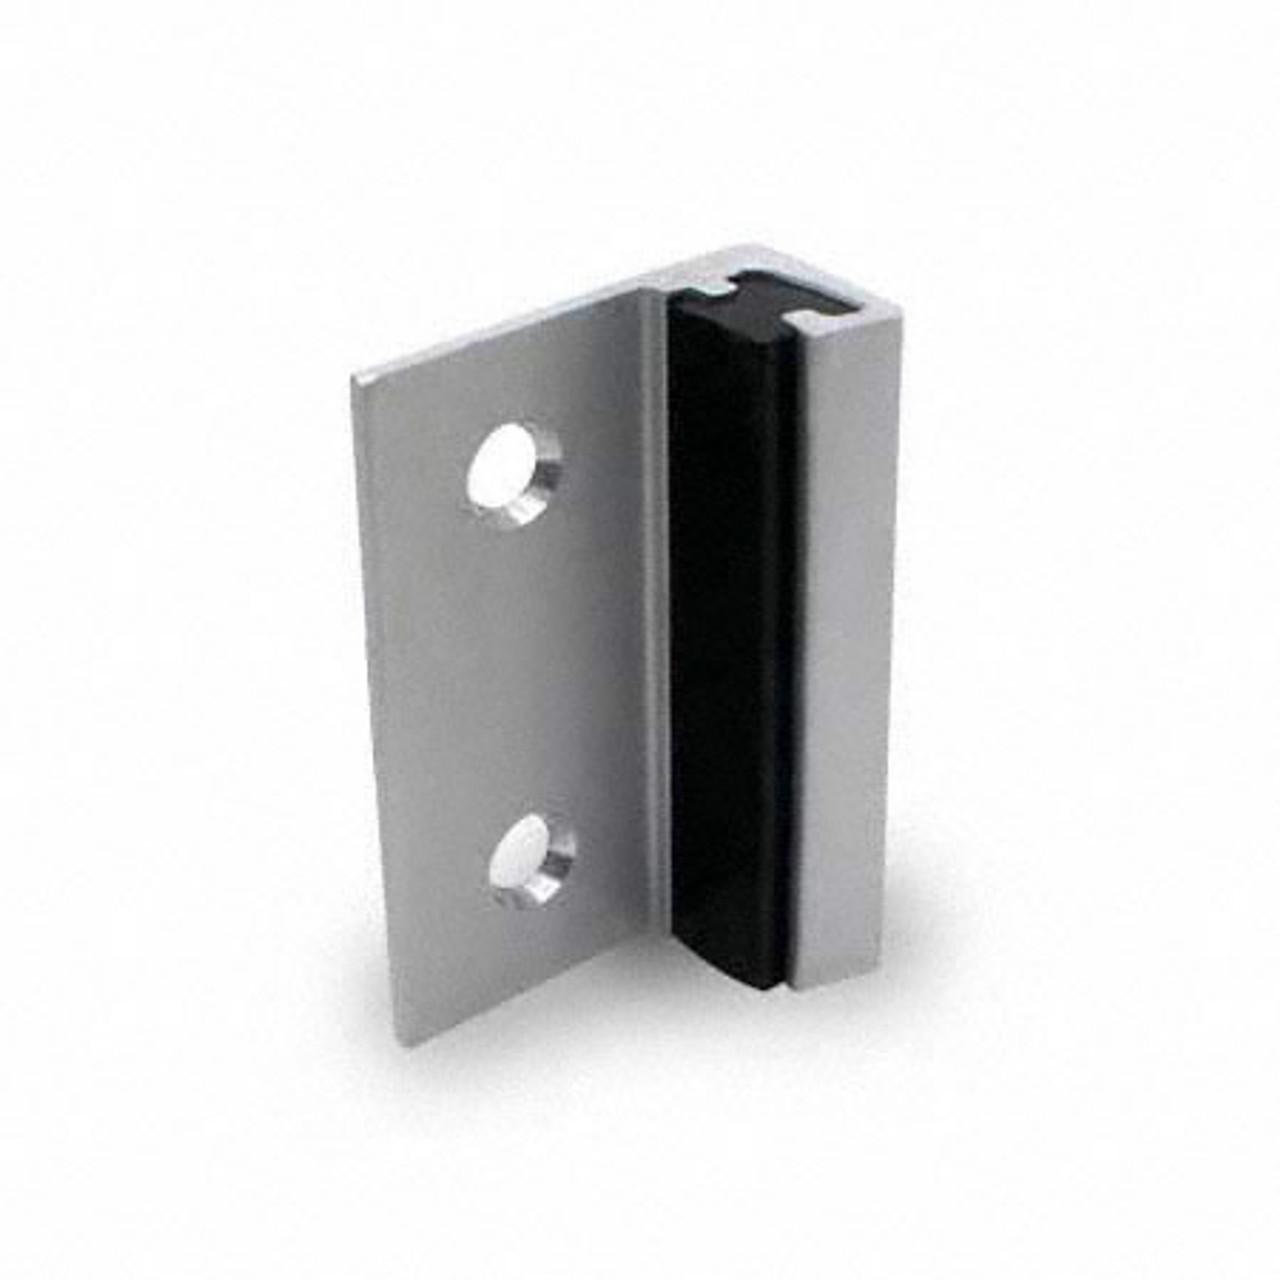 Flat Back Aluminum Outswing Keeper (2060-OAL-F)